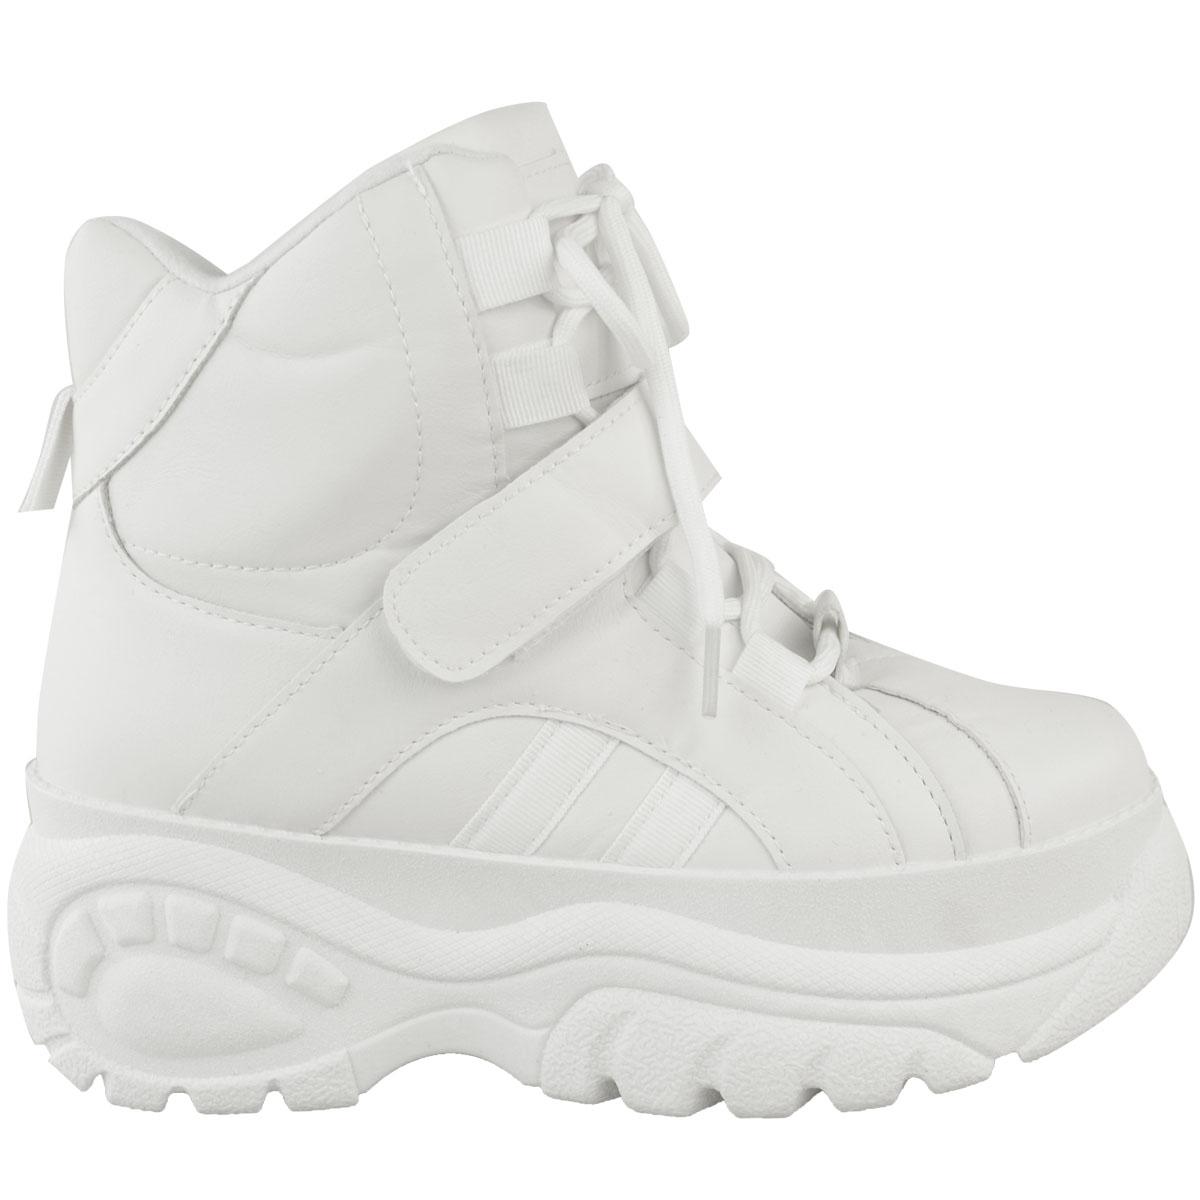 Womens-Ladies-High-Platform-Trainers-Sneakers-Retro-Boots-Hi-Top-Wedge-Punk-Goth thumbnail 9